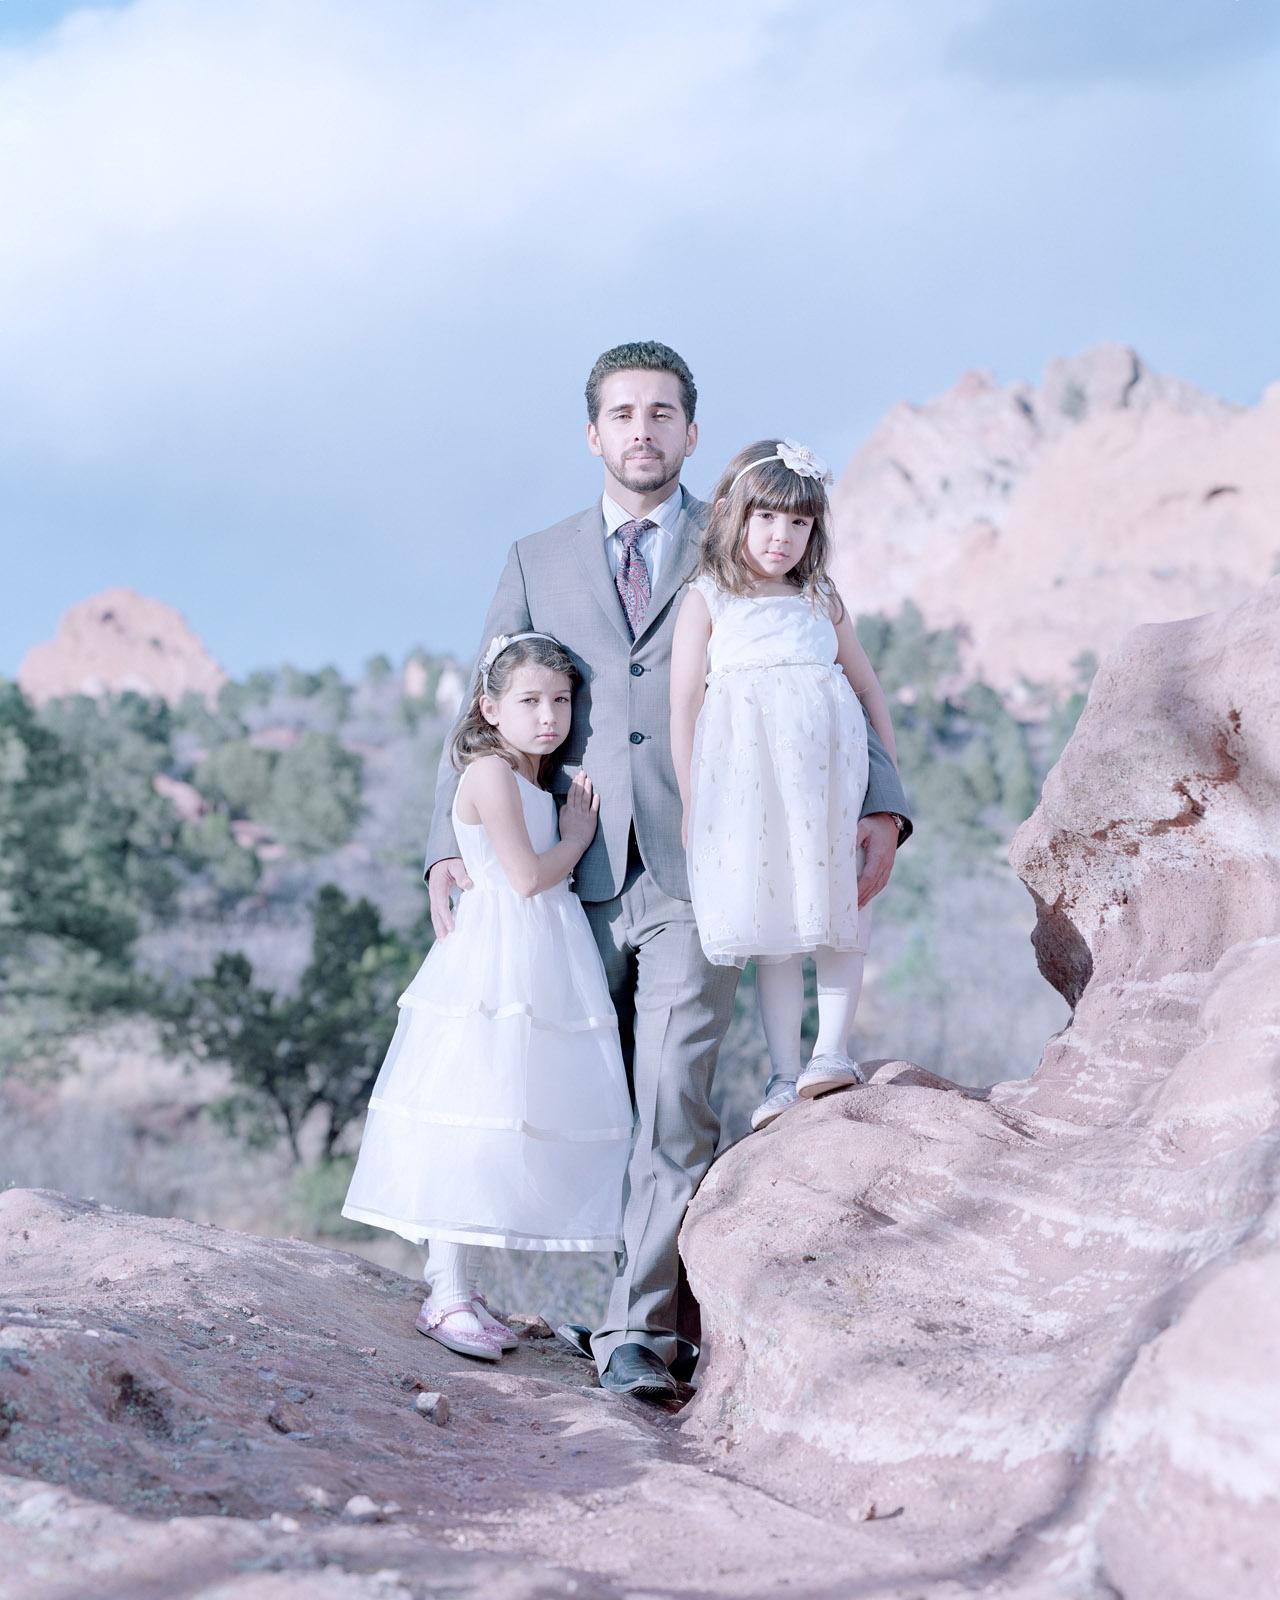 Laila, Antonio and Maia Sa Colorado Springs, Colorado